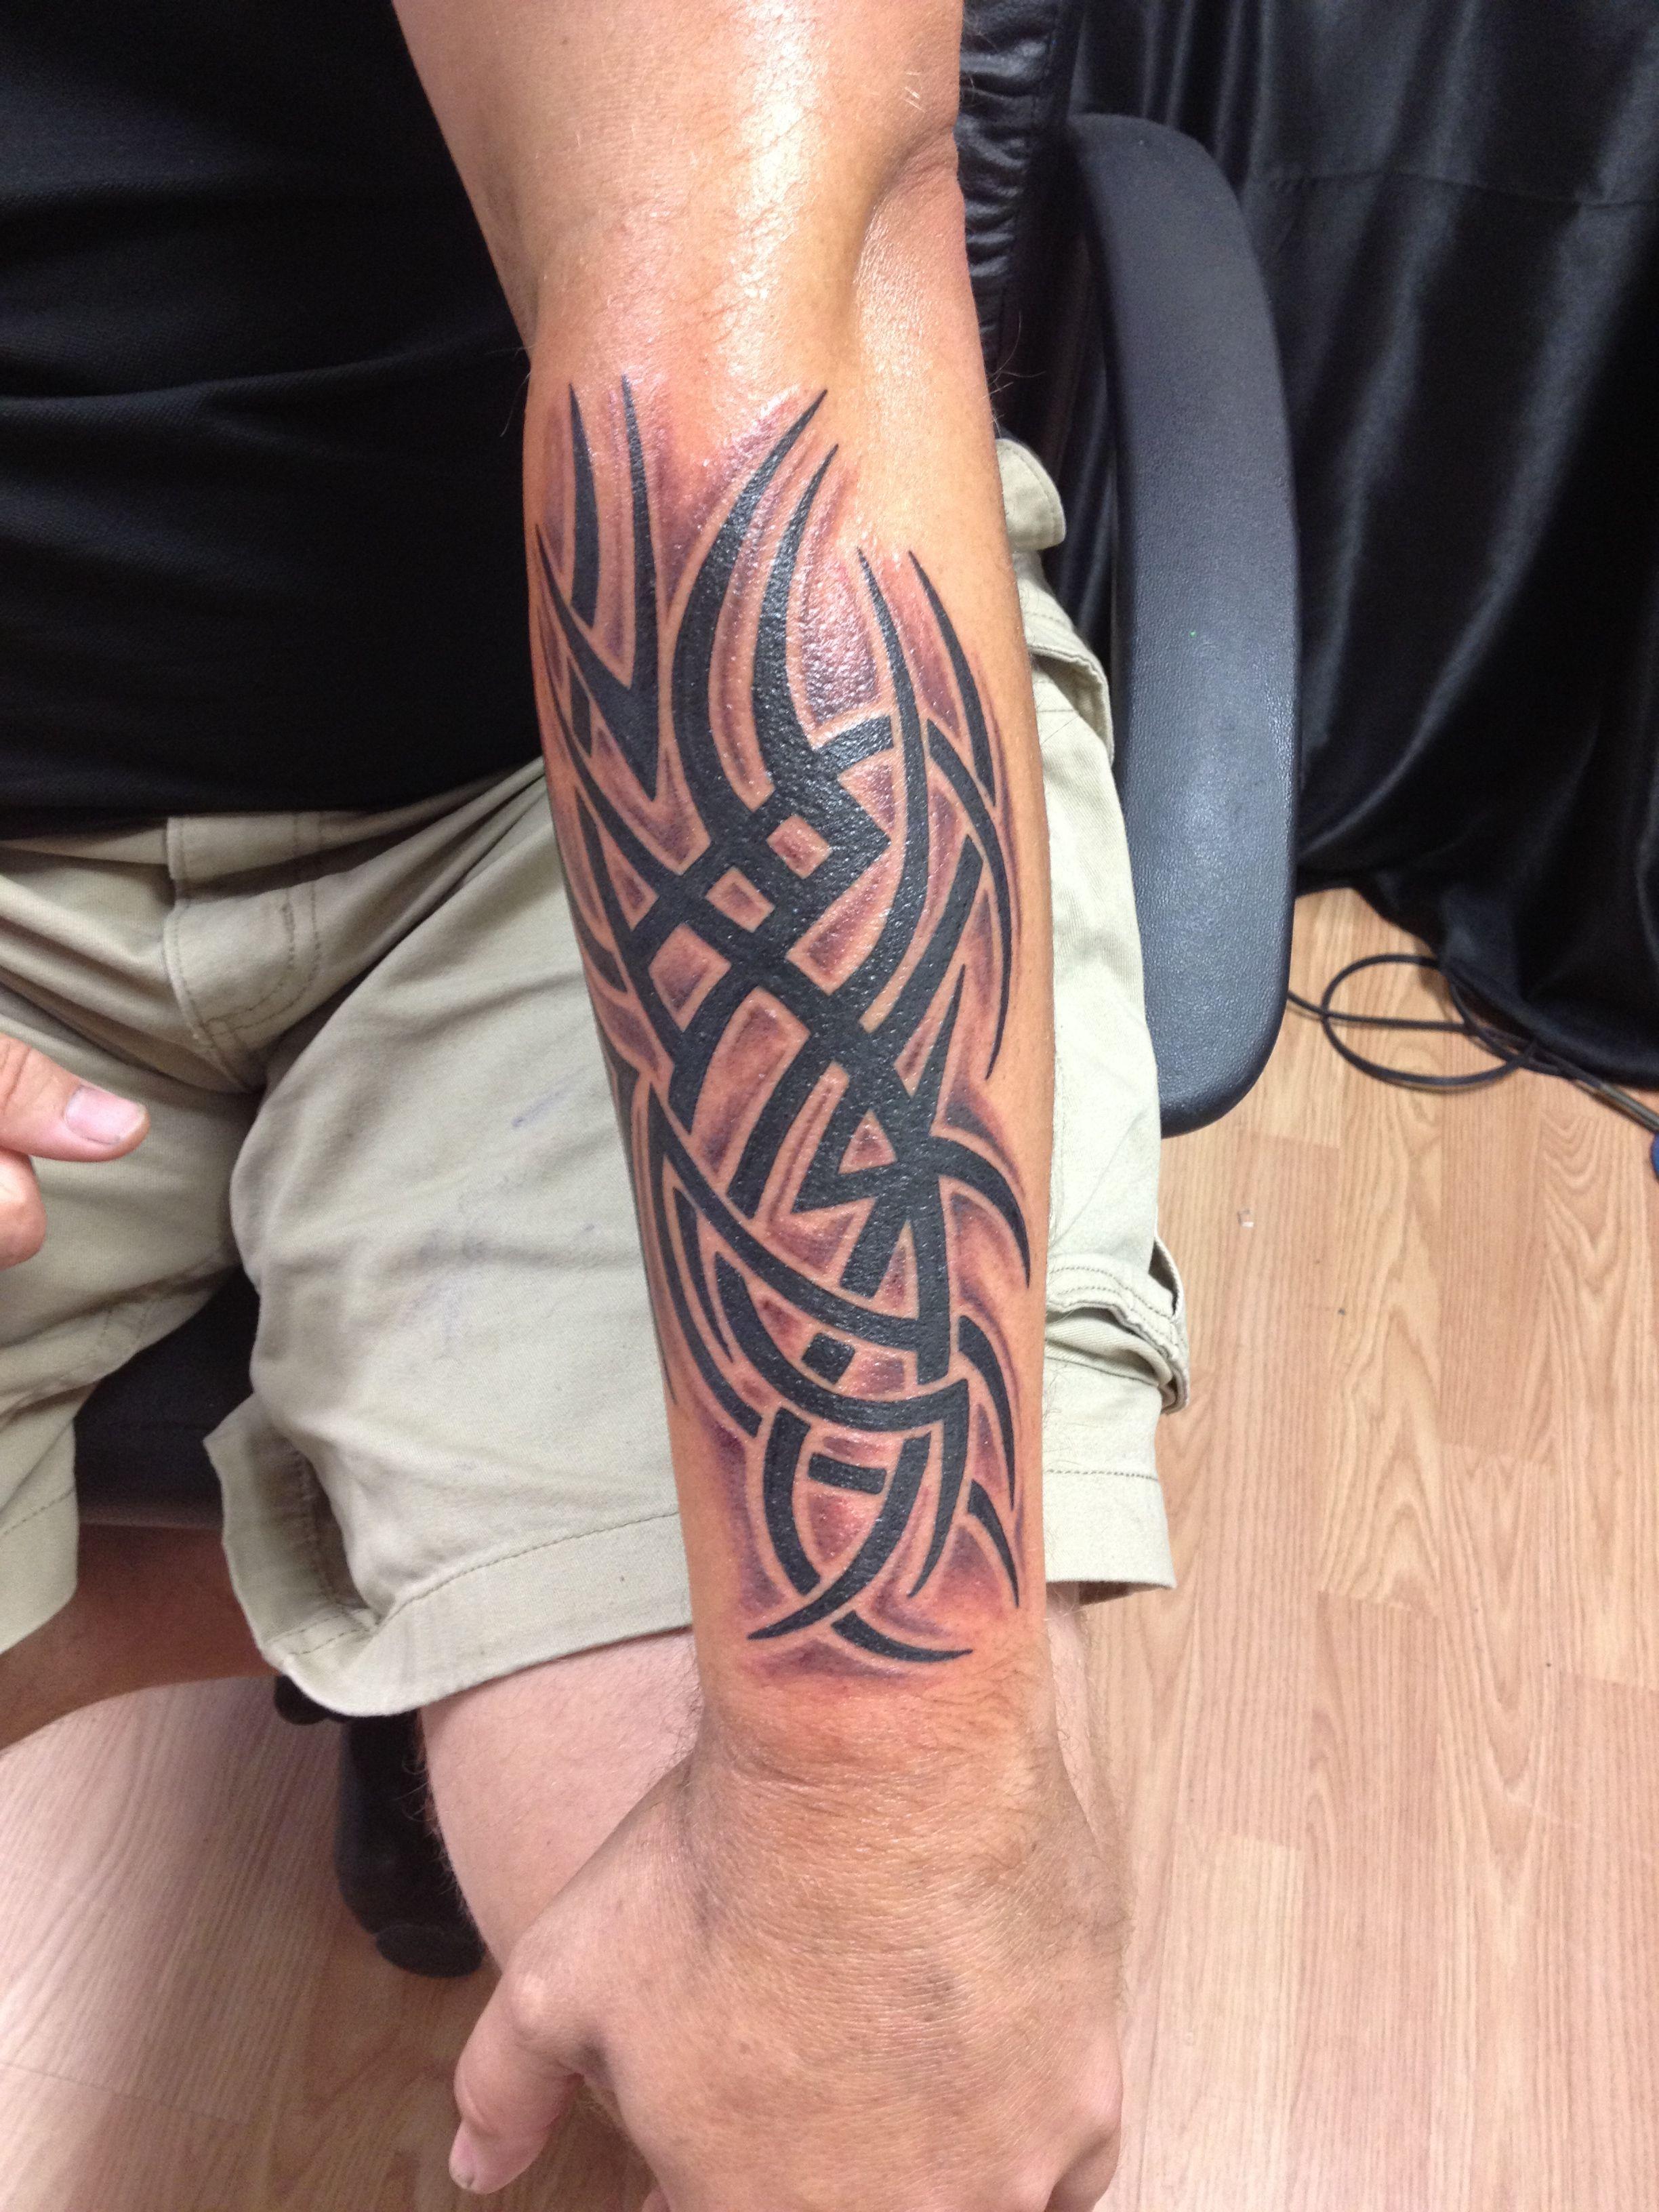 75 Tribal Arm Tattoos For Men - Interwoven Line Design Ideas